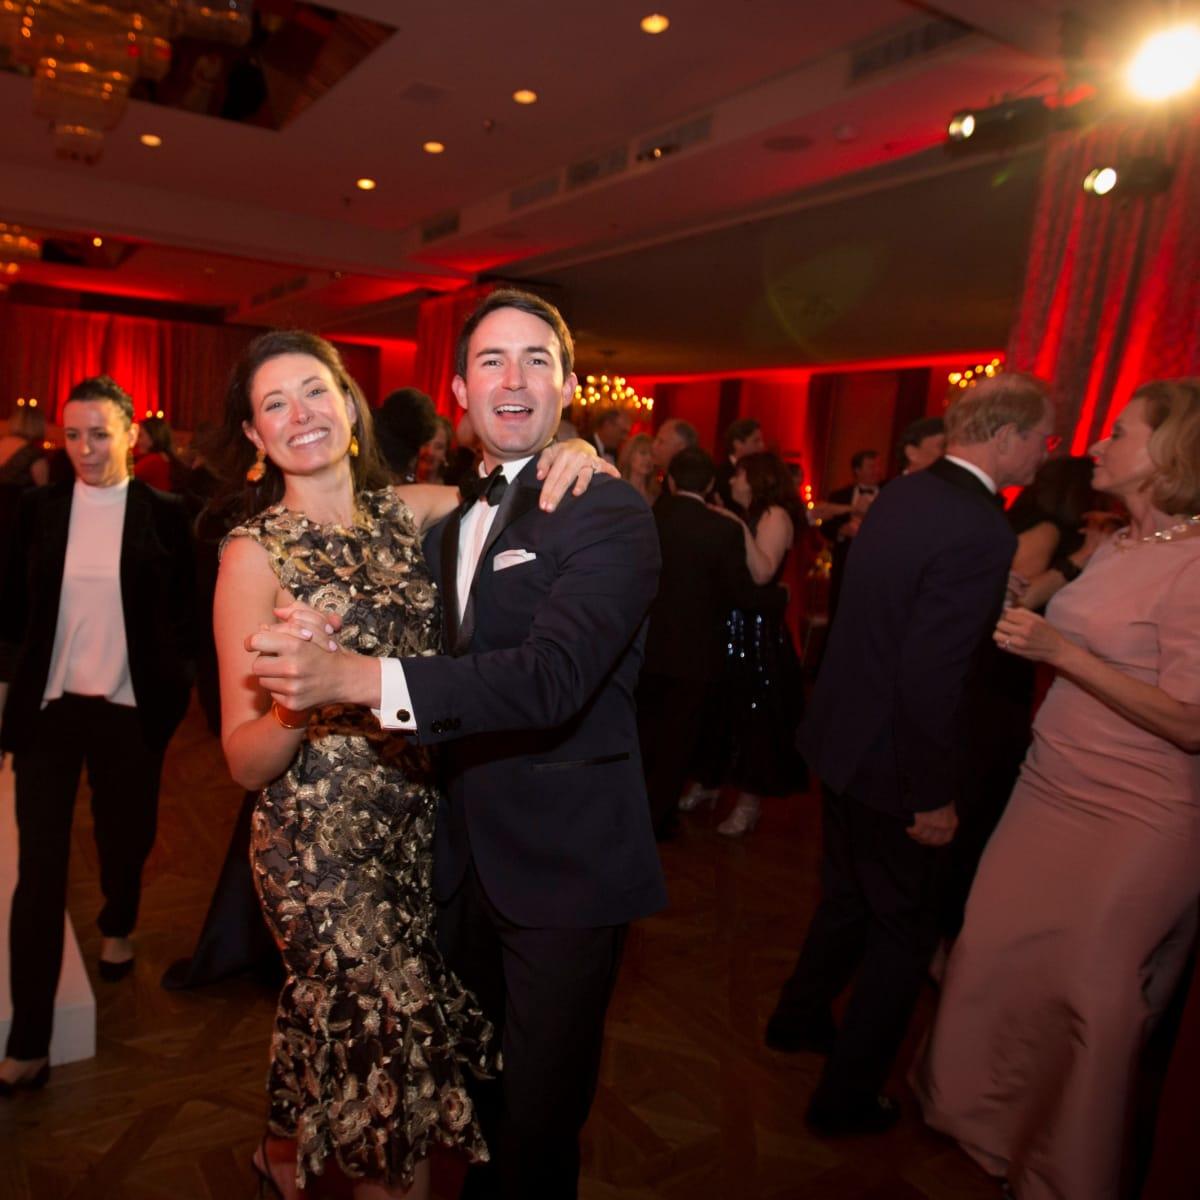 Cliburn gala 2018, Kate Thompson, Zach Crain